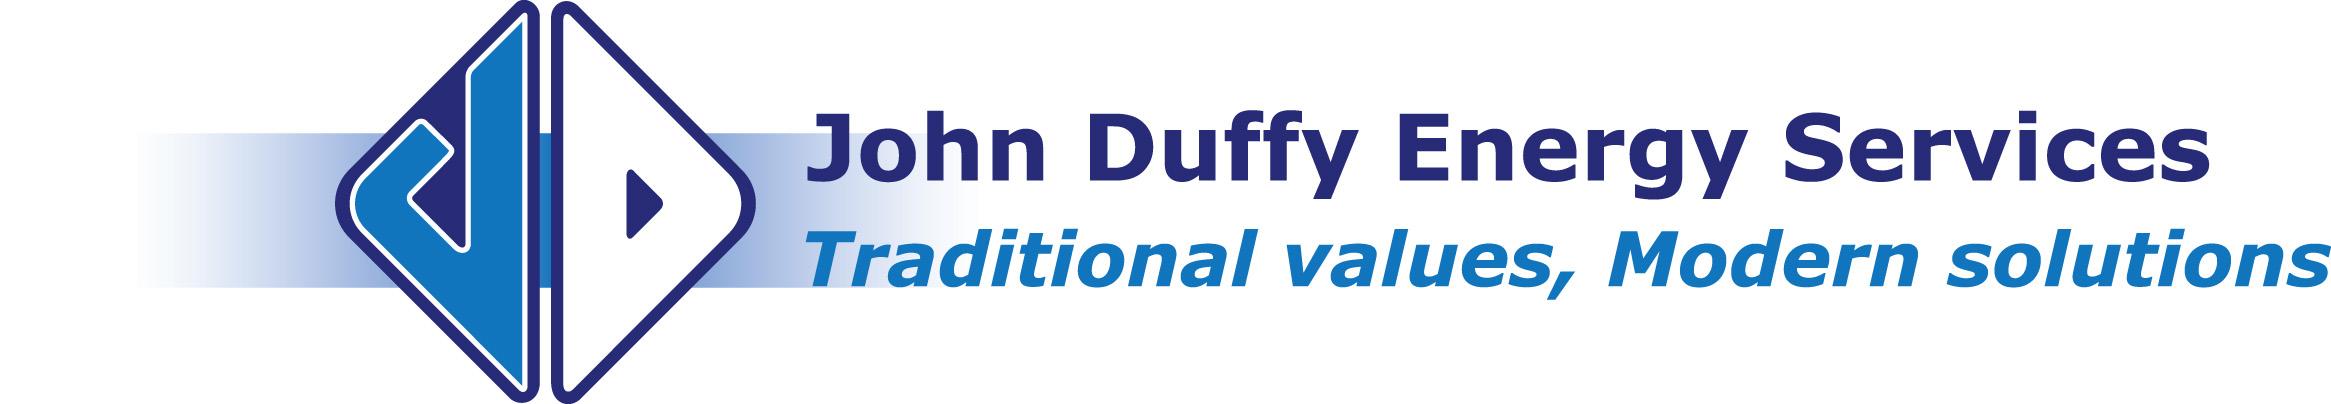 John Duffy Energy